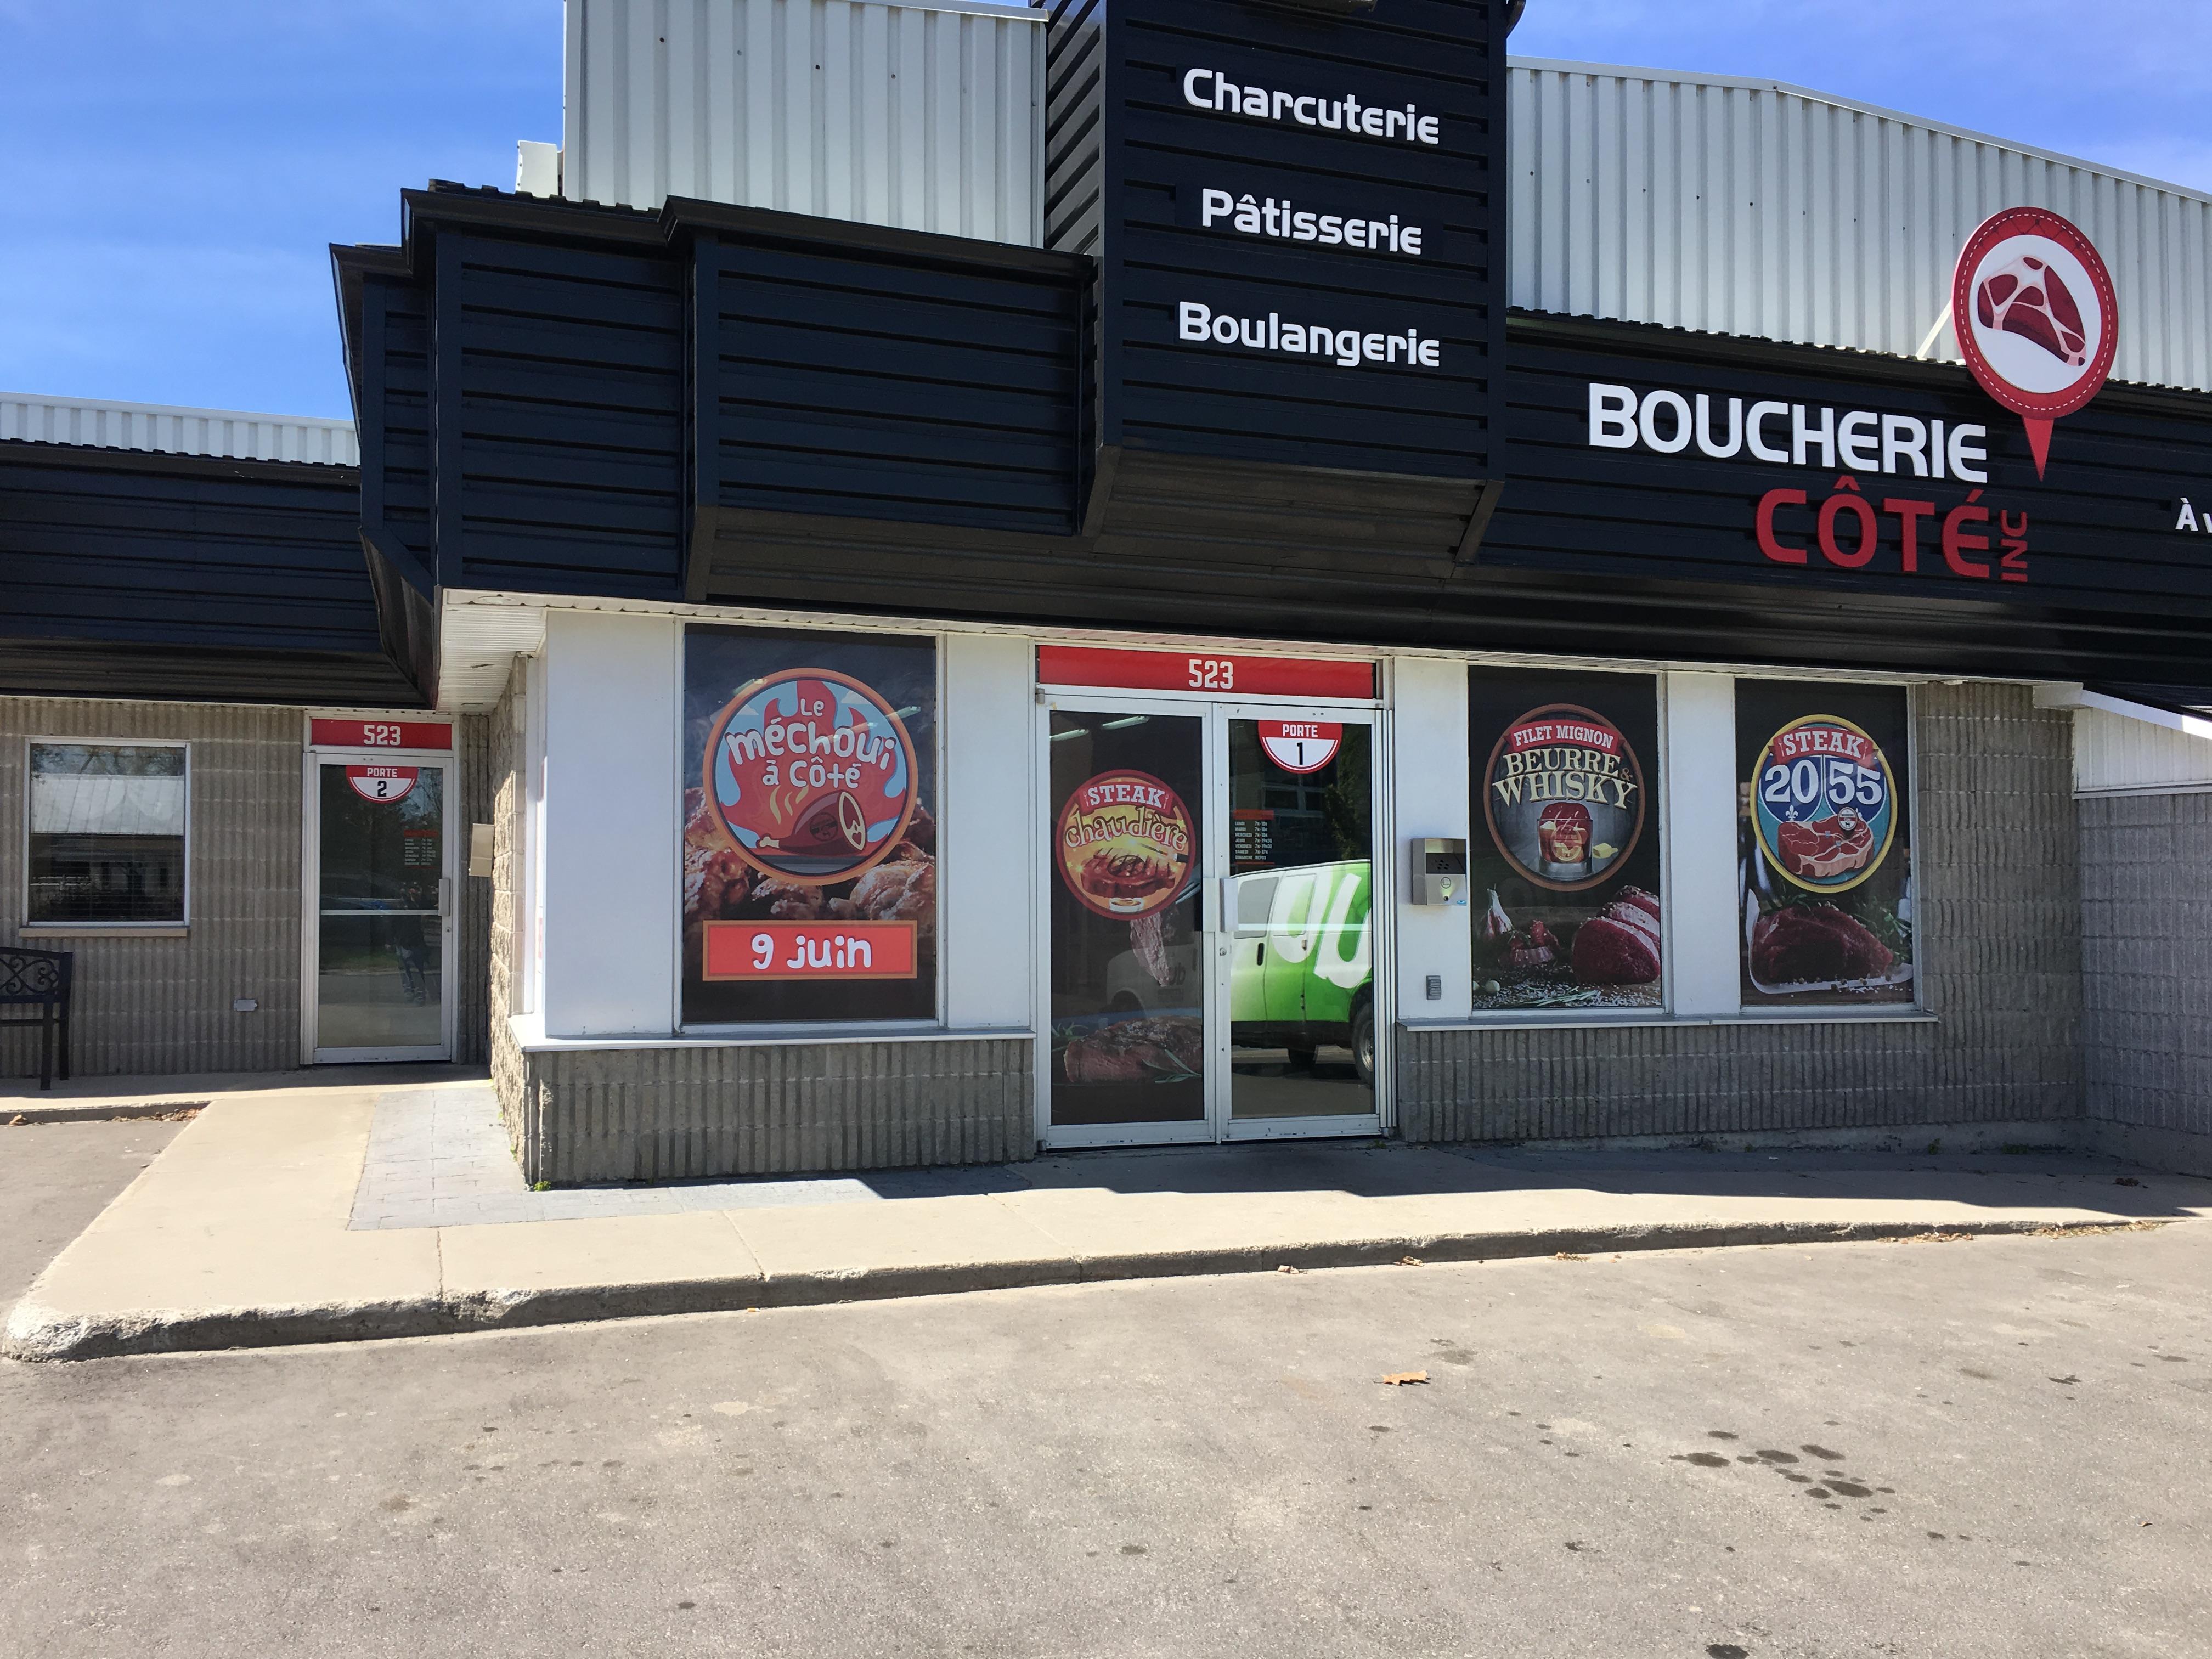 boucherie-cote-affichage-vitrine-2018